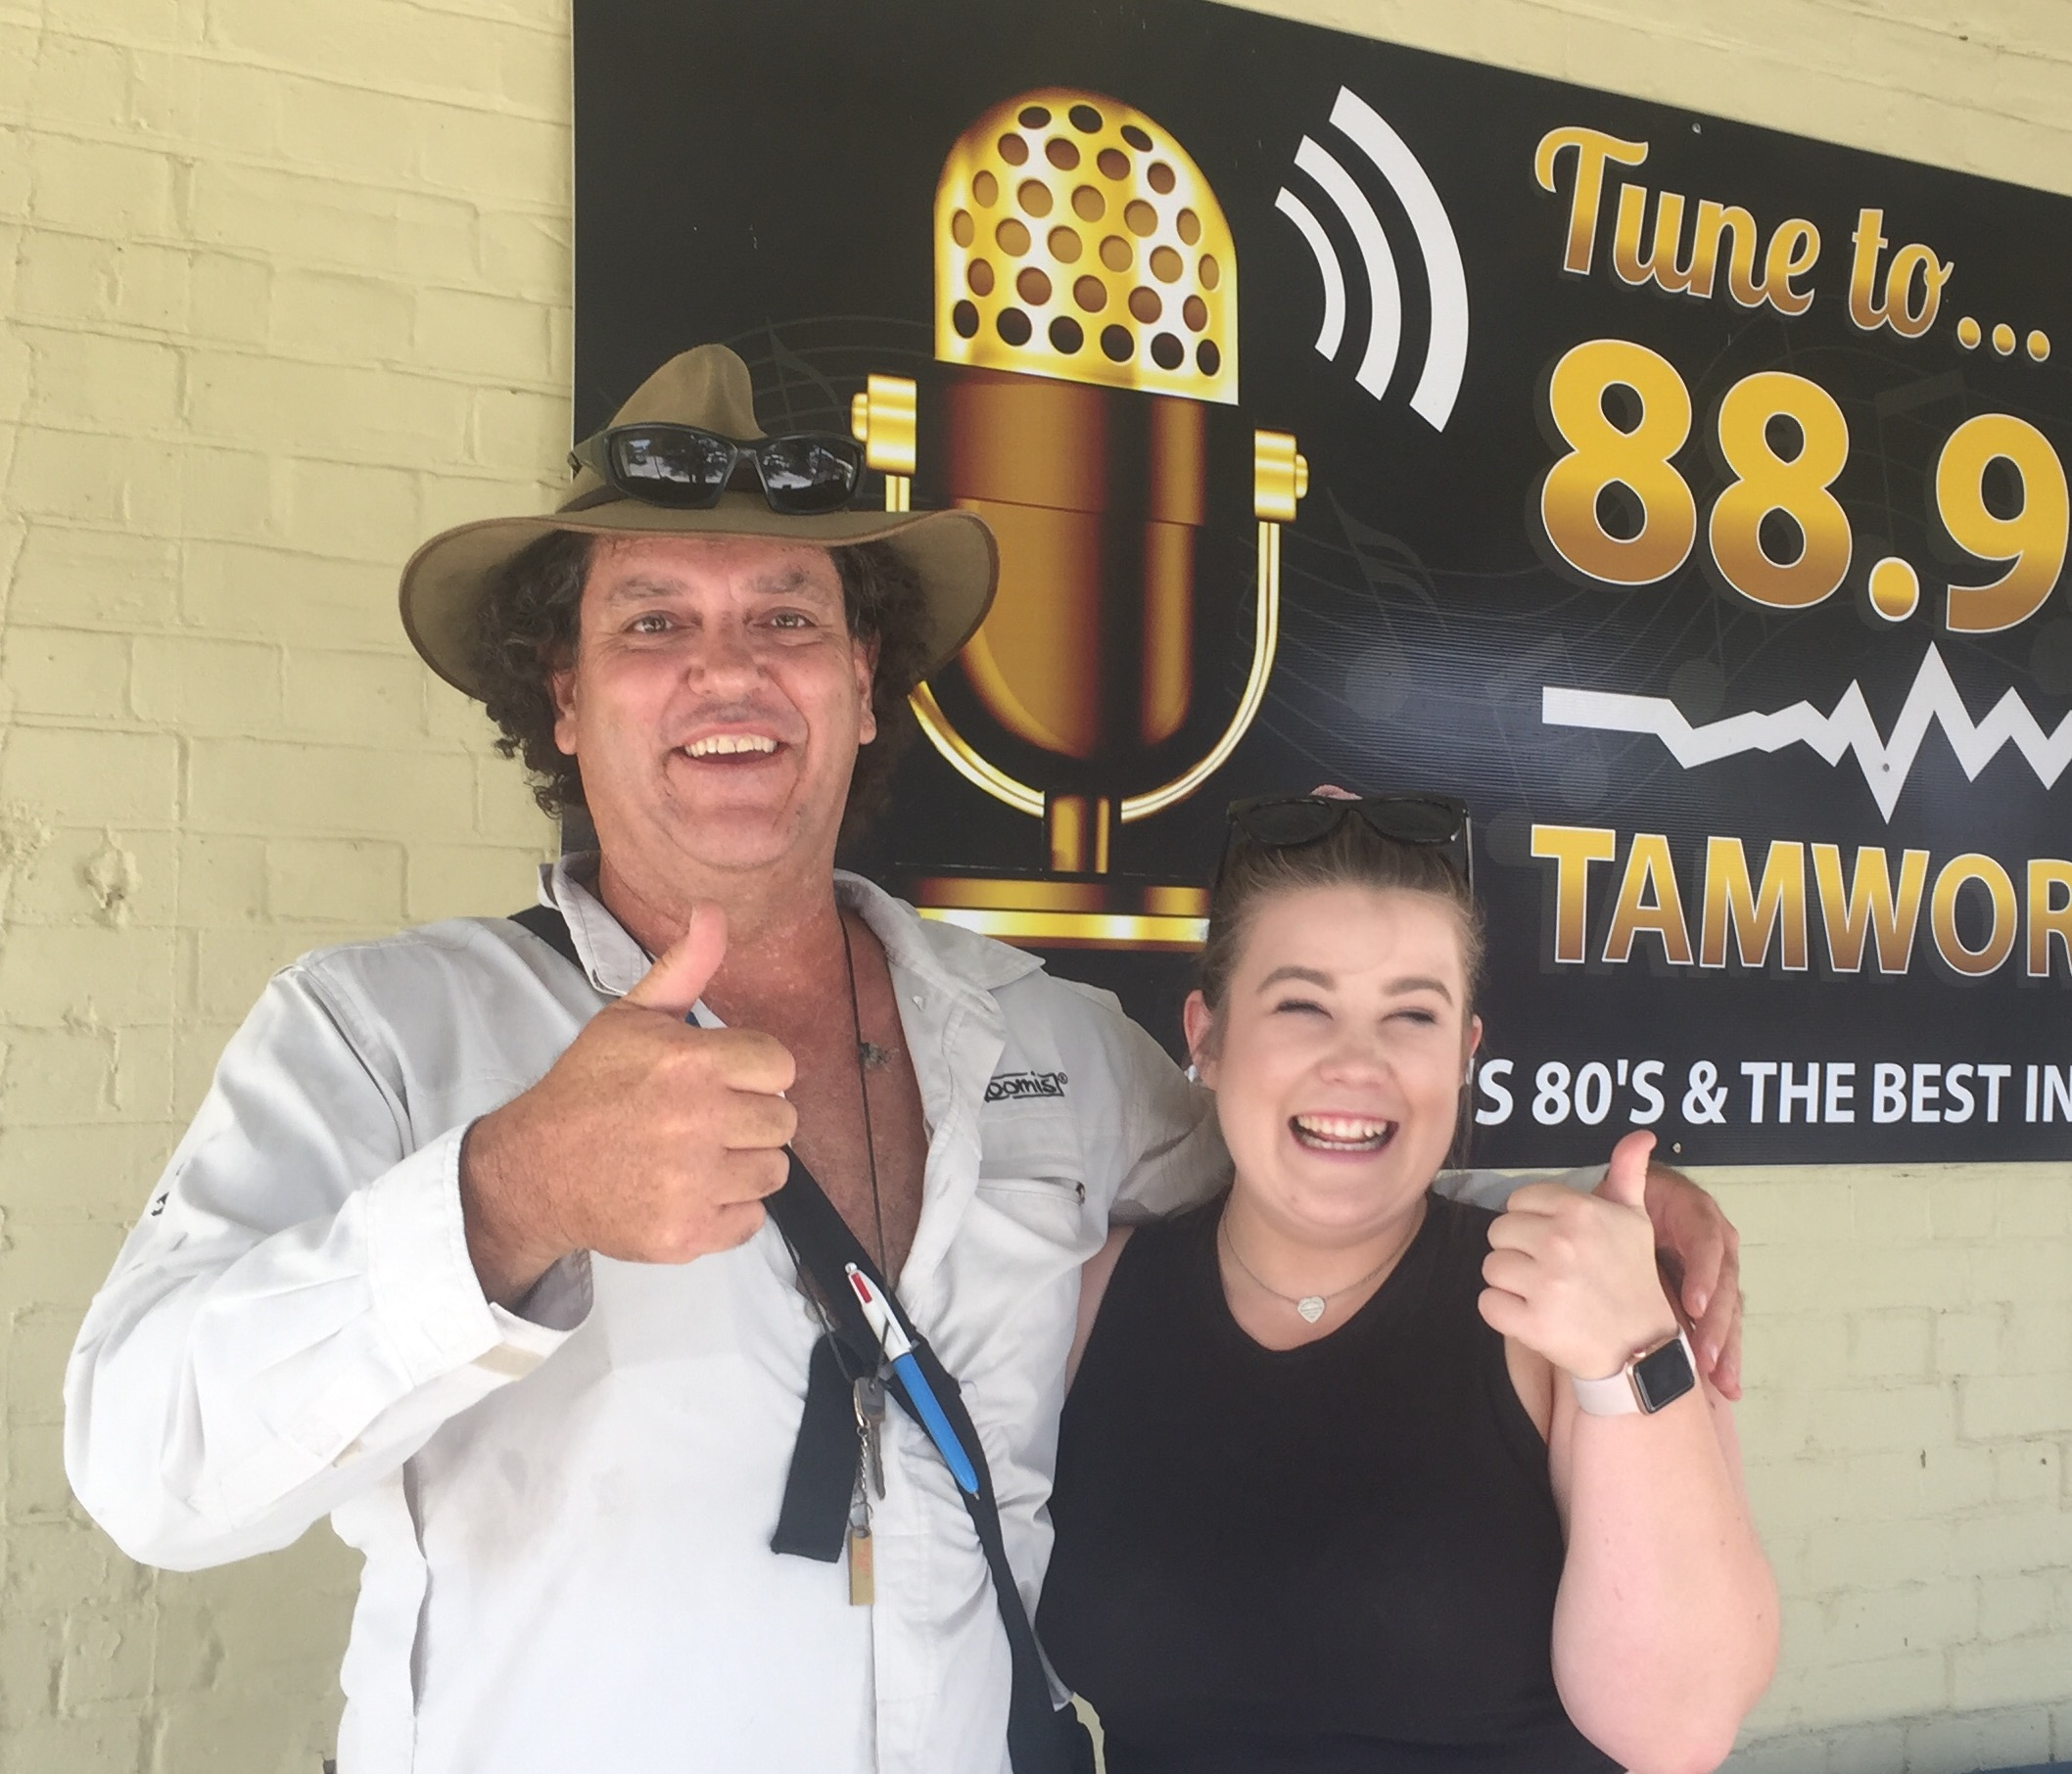 Radio Tour 18 Tamworth 88.9fm.jpg